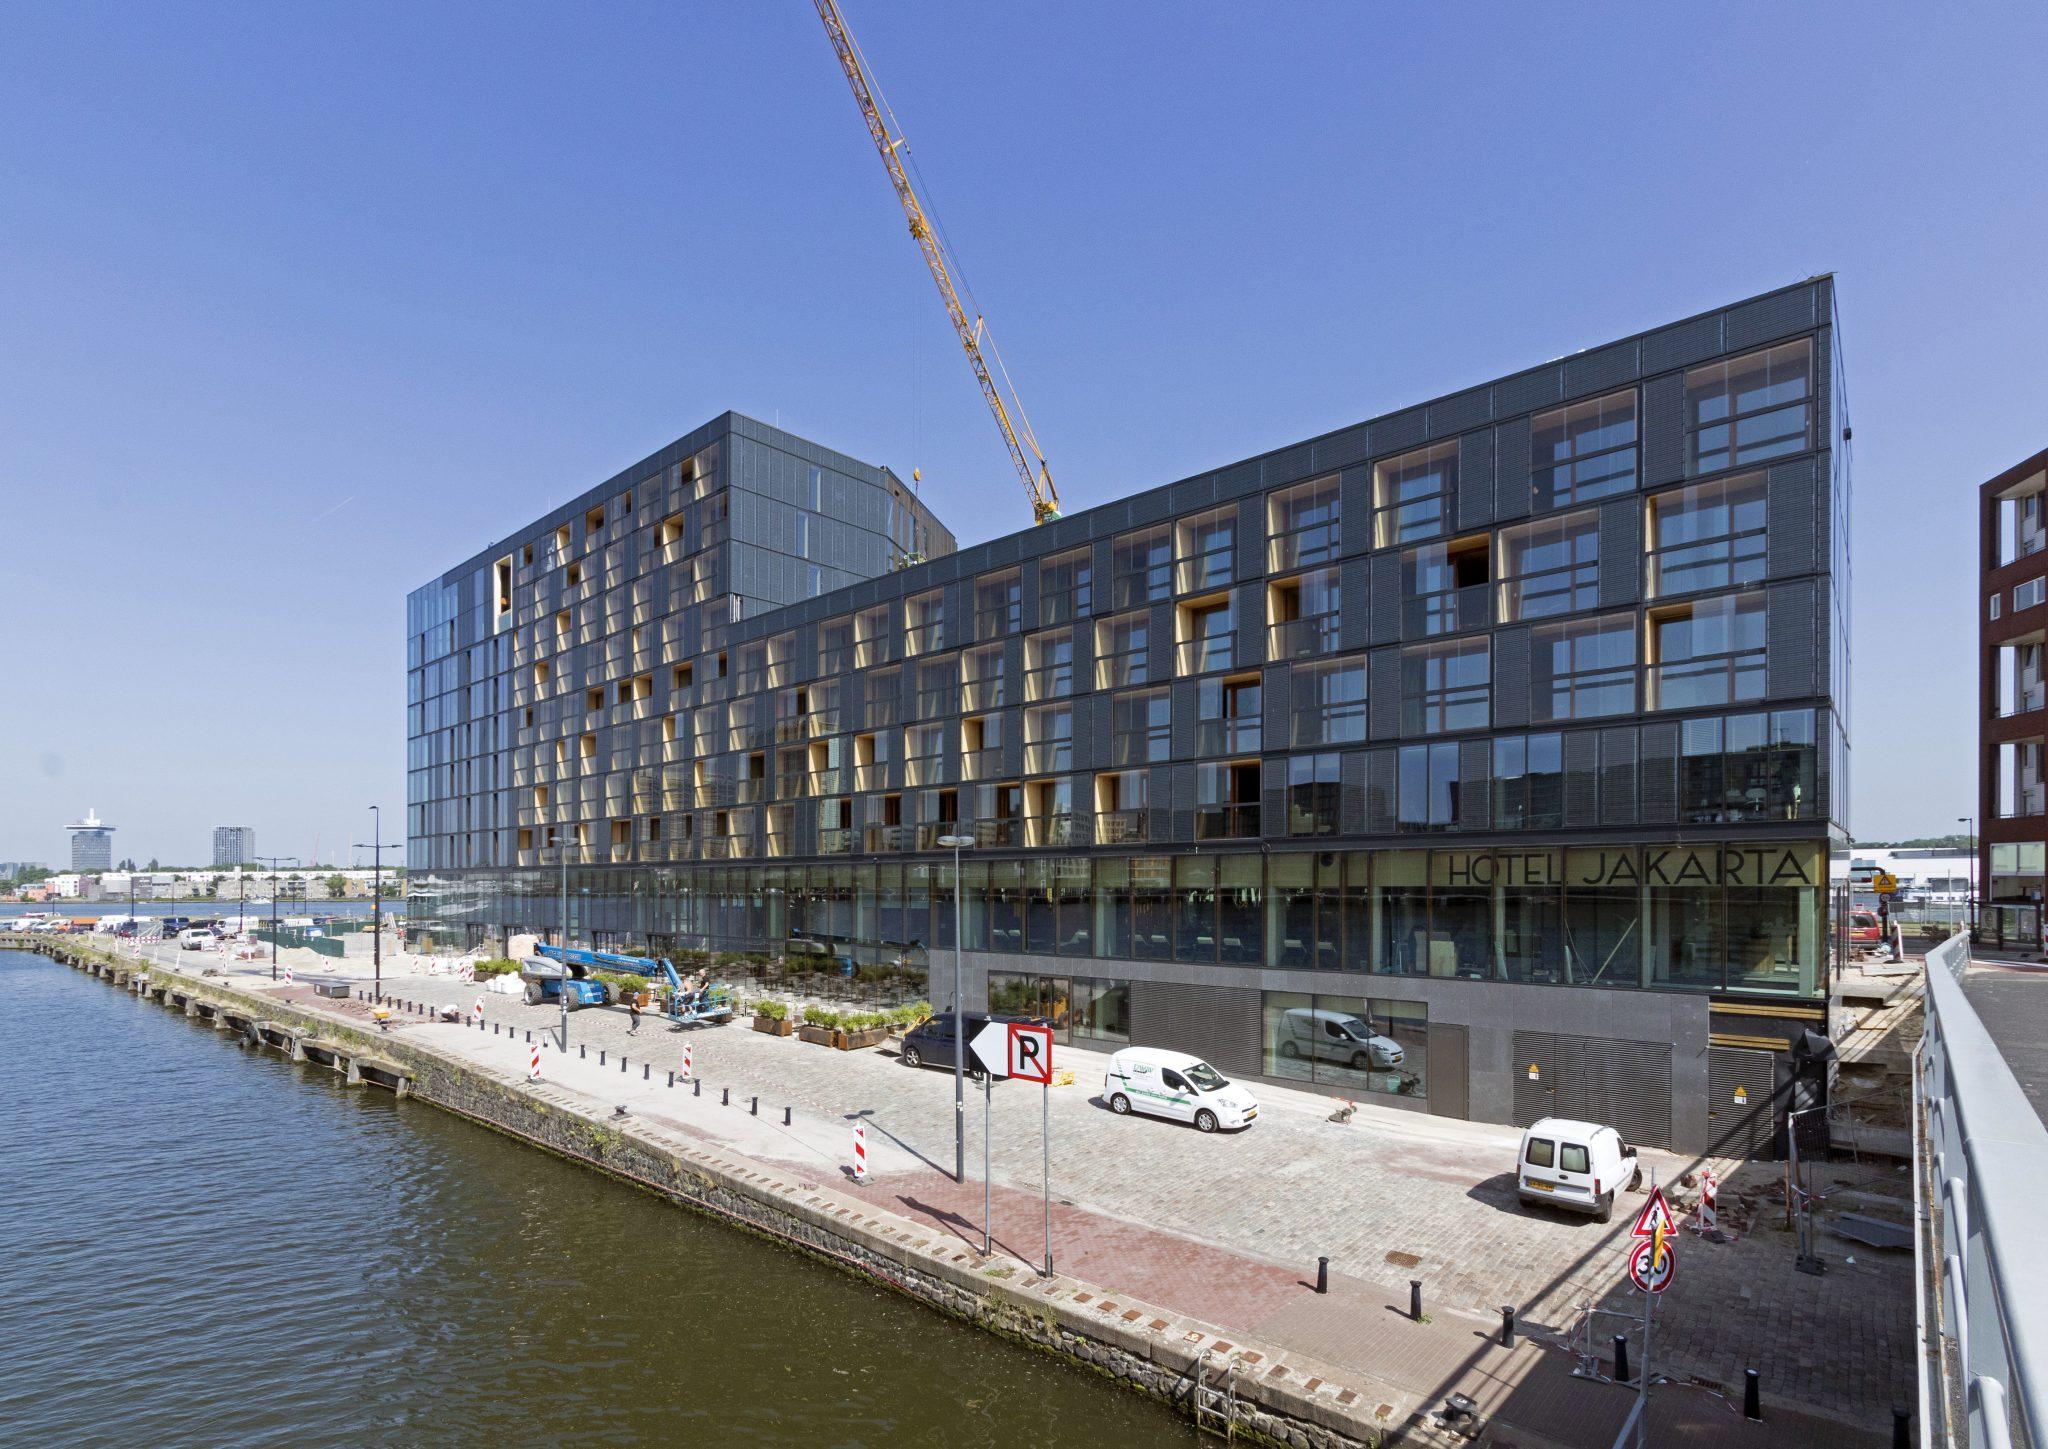 hotel jakarta Amsterdam, draagconstructie